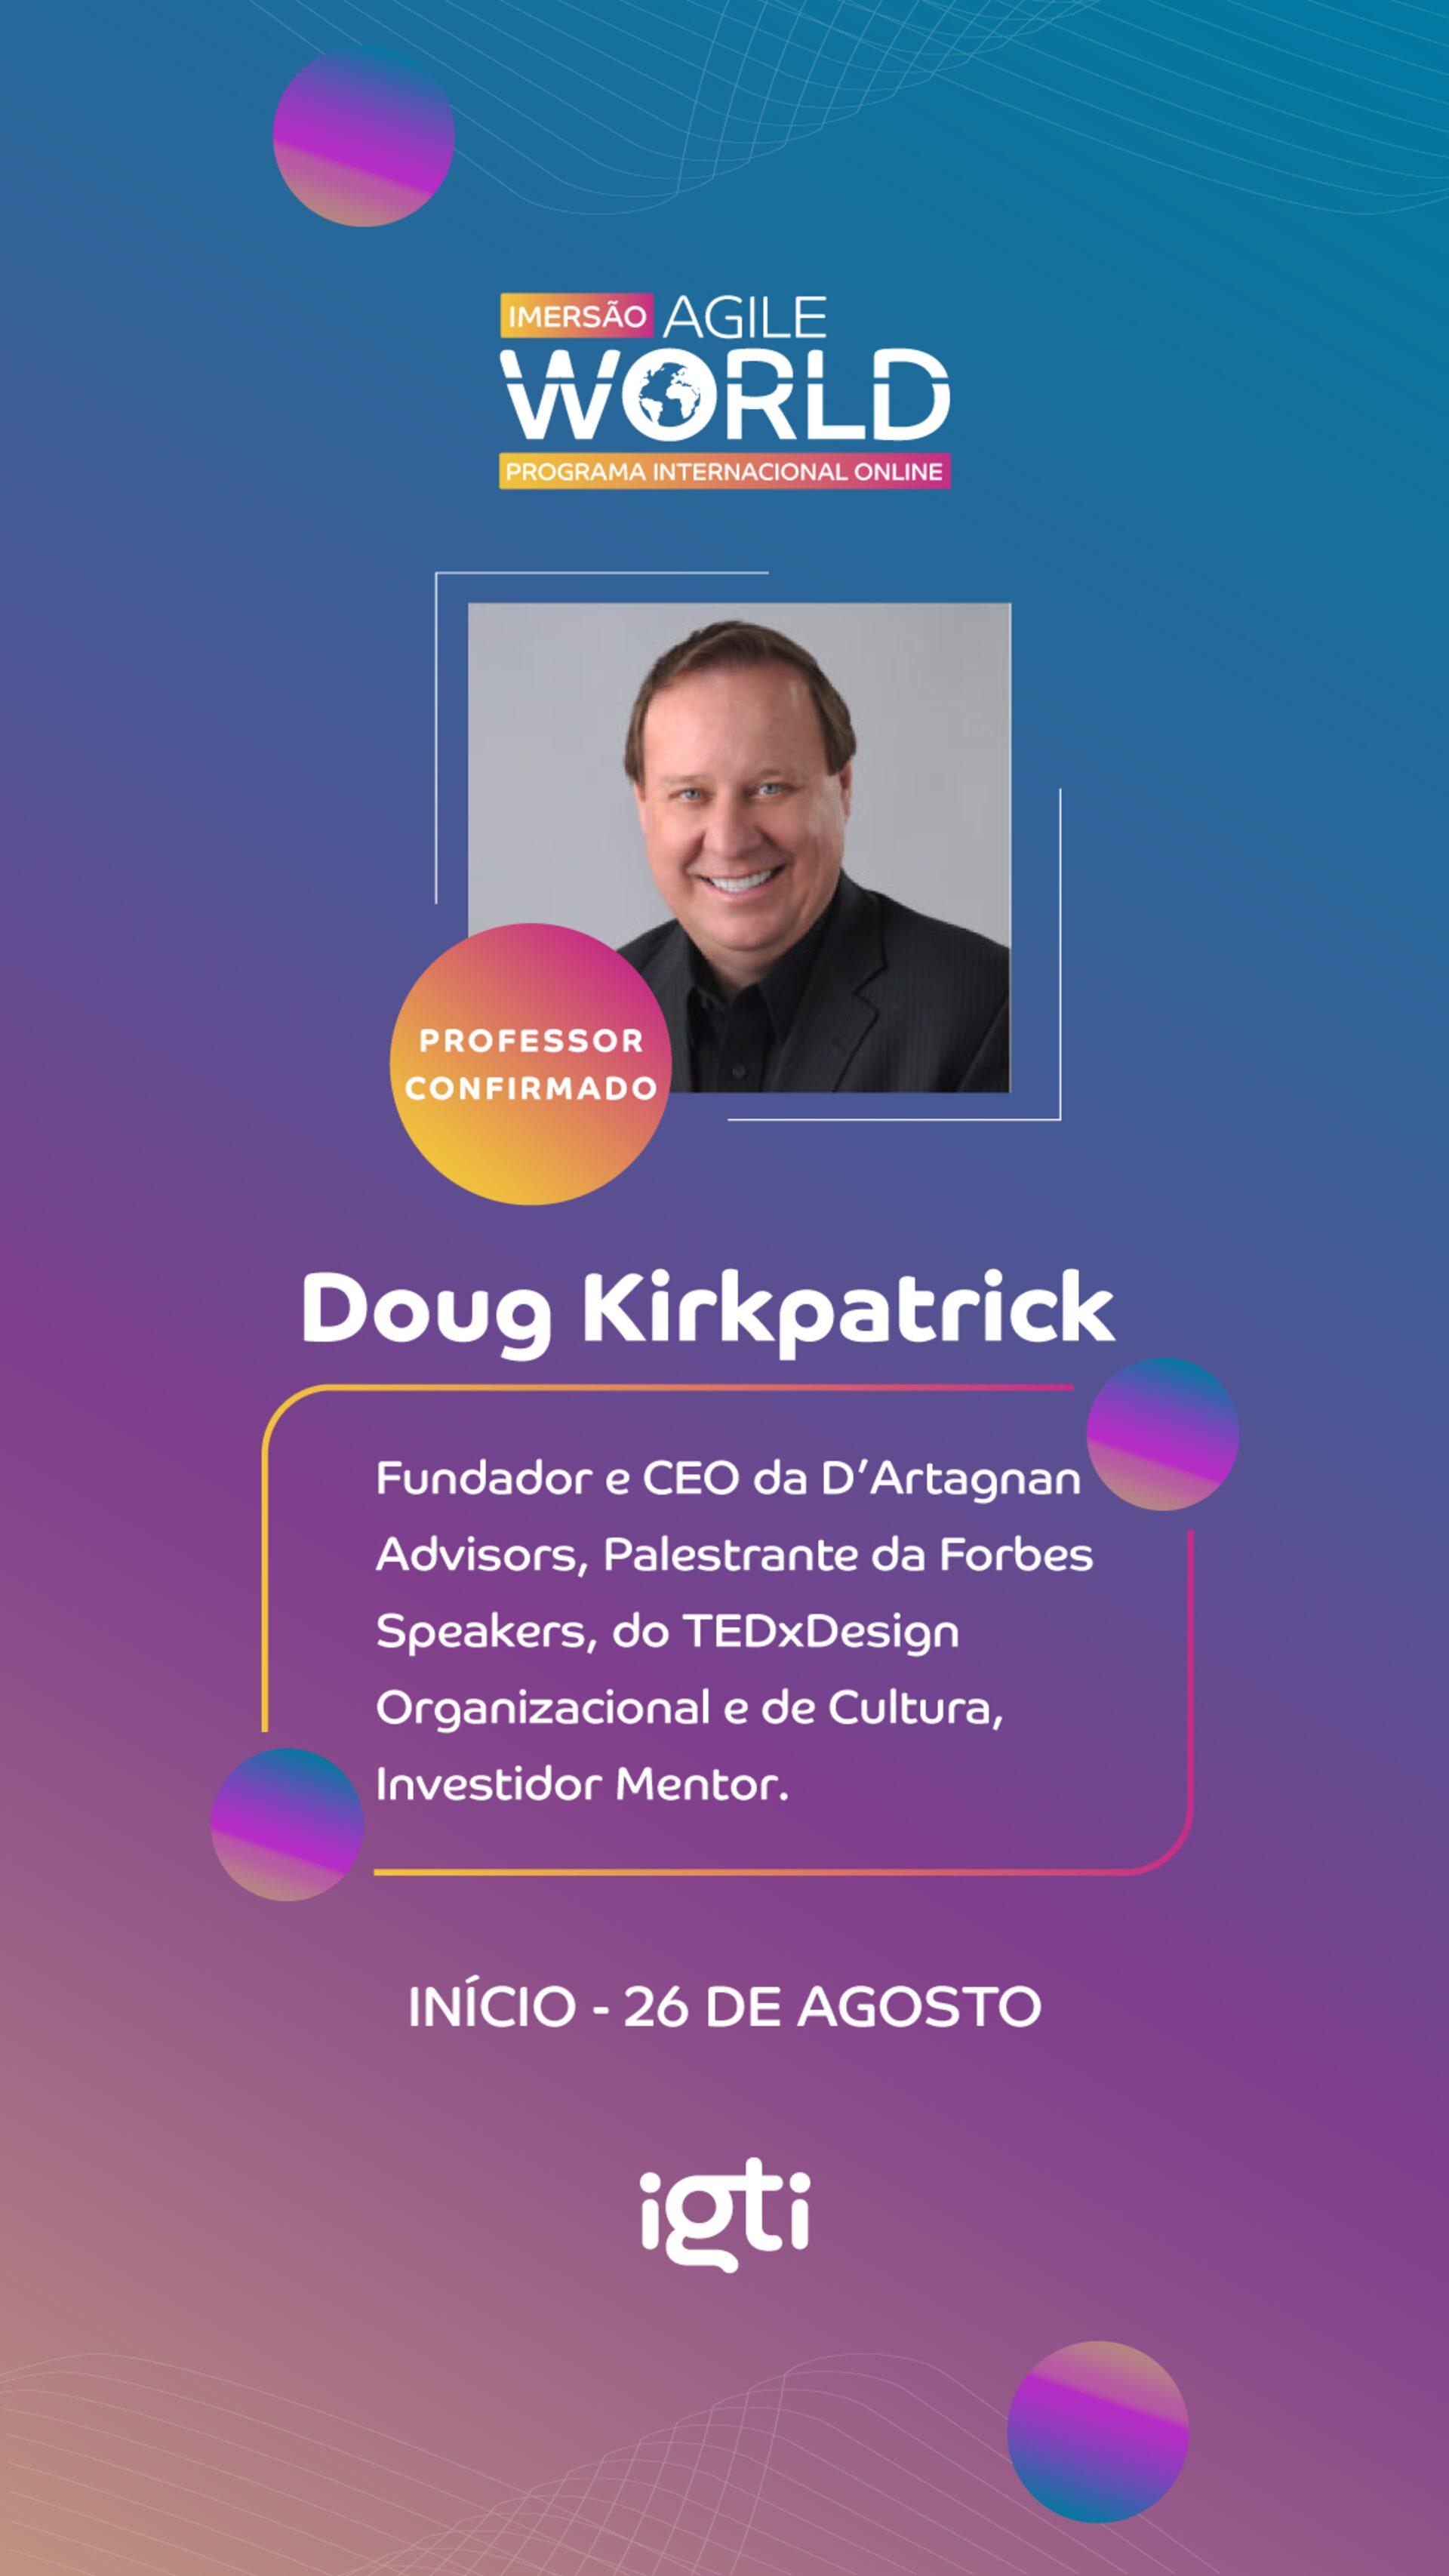 Speaking at International Program Agile World Brazil (sponsored by igti), October 14, 2021